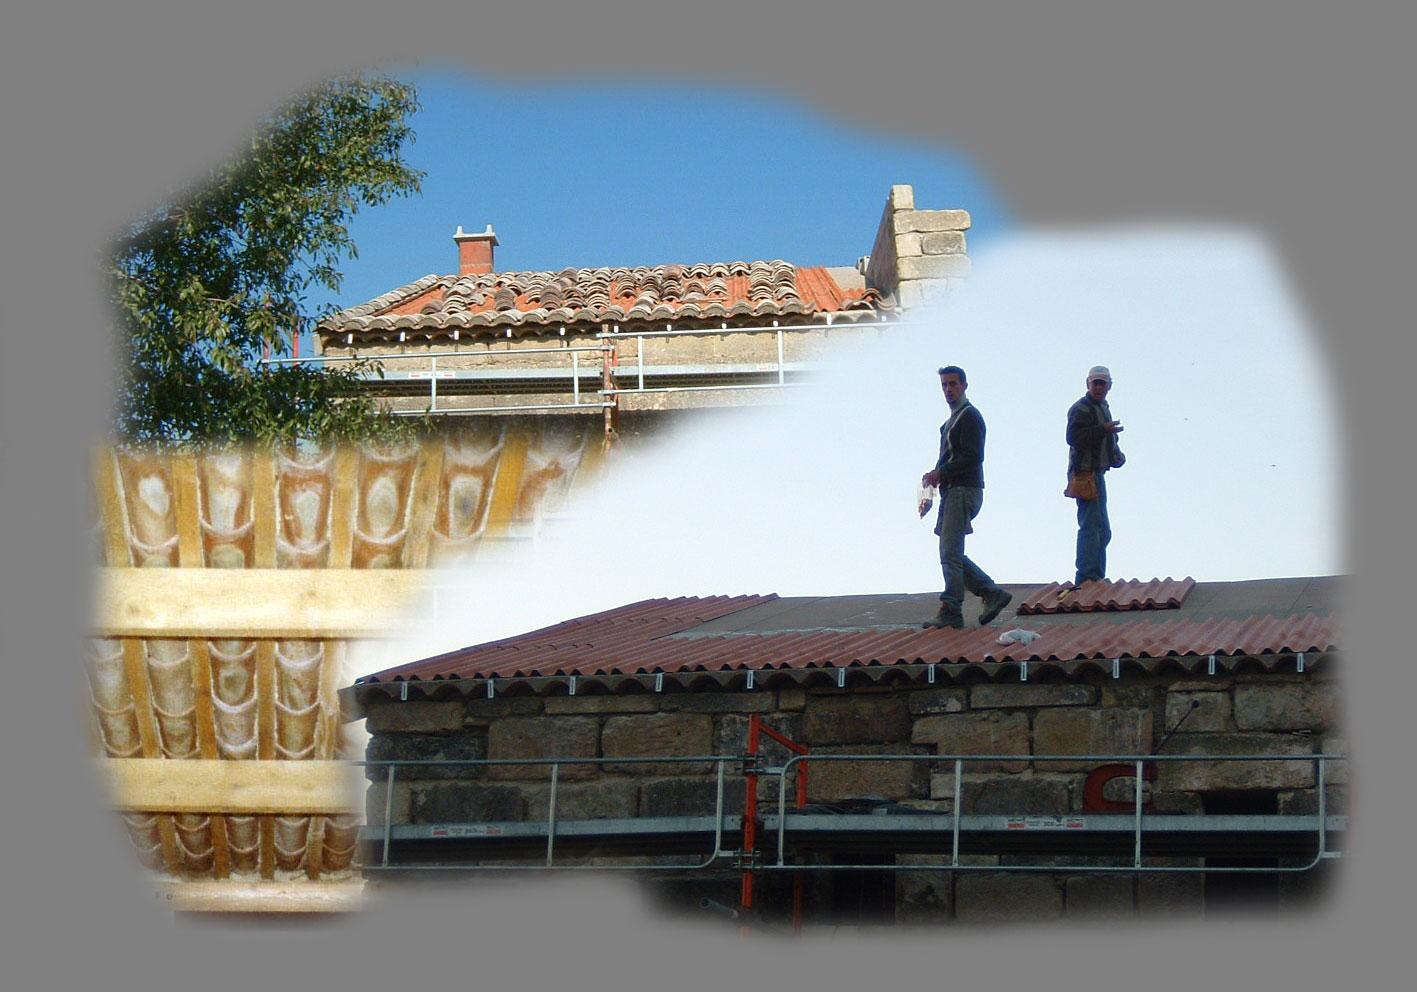 Renovation toiture uzes gard 30 9 et r novation for Construction piscine uzes